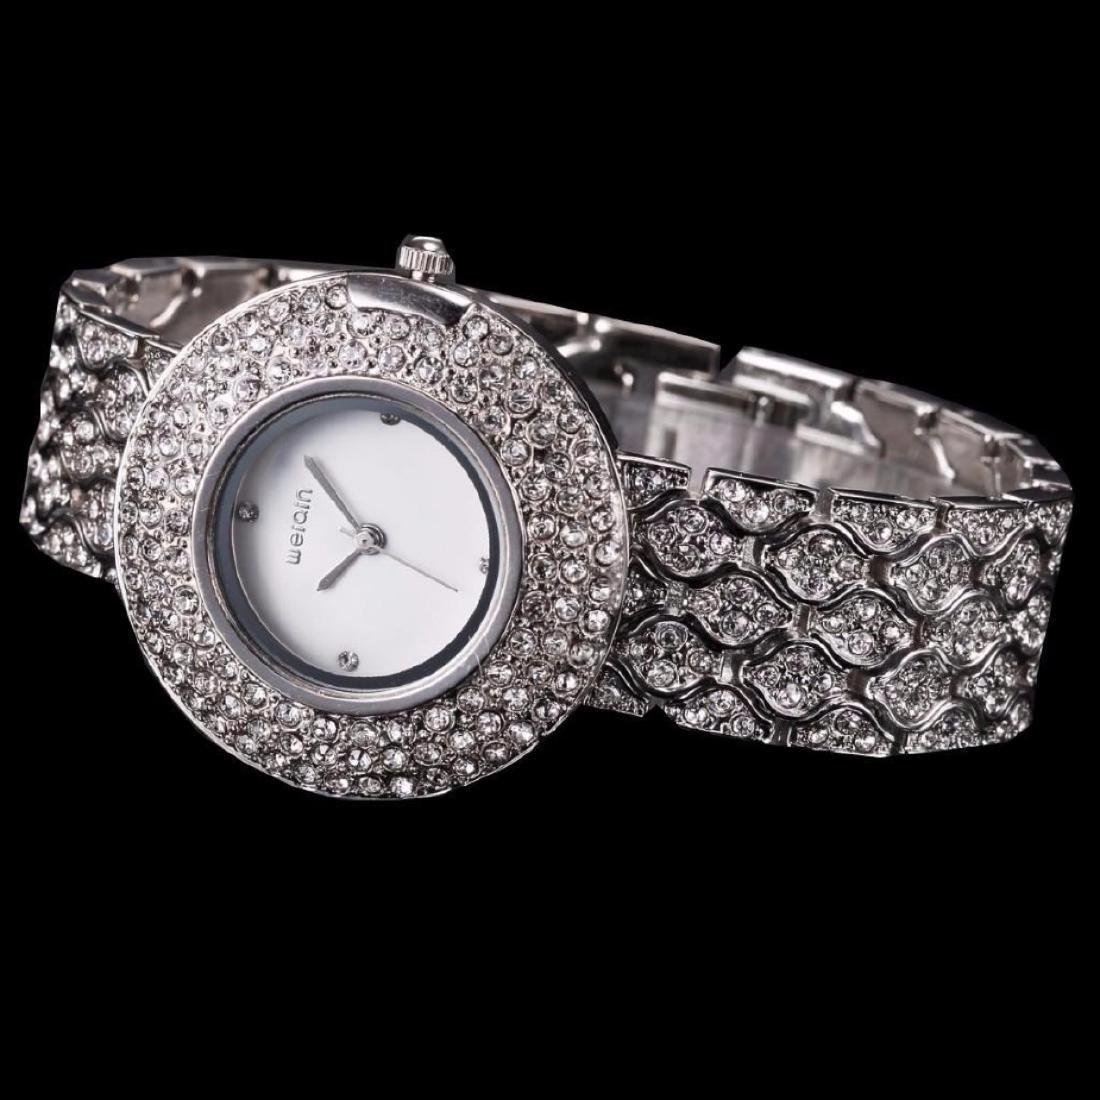 Women's Stainless Steel & Crystal Quartz Bracelet Wrist - 2